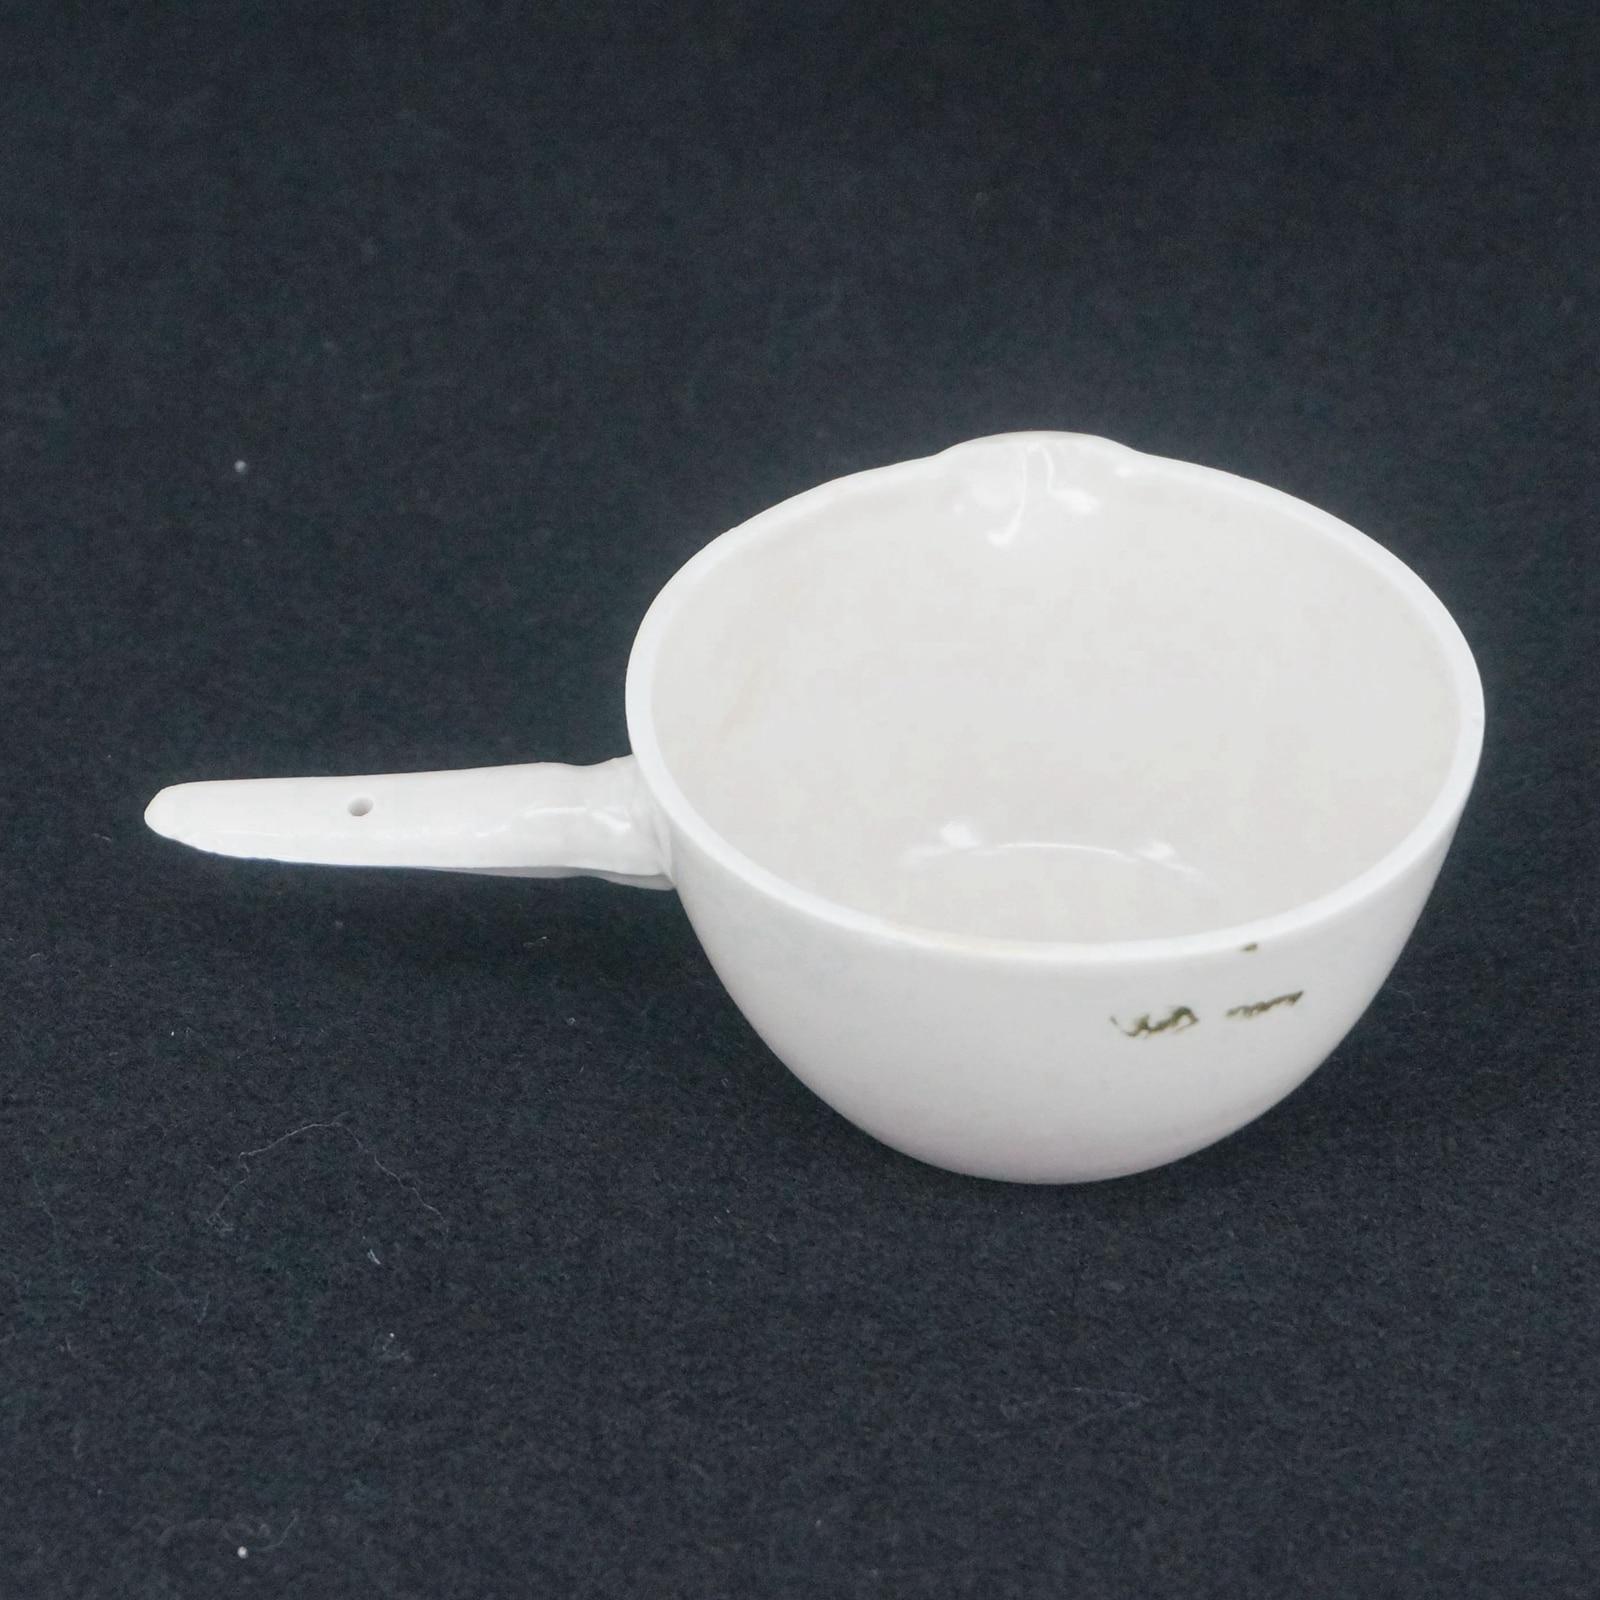 100ml Ceramic Evaporating dish Round bottom with handle For ... for Laboratory Evaporating Dish  111ane